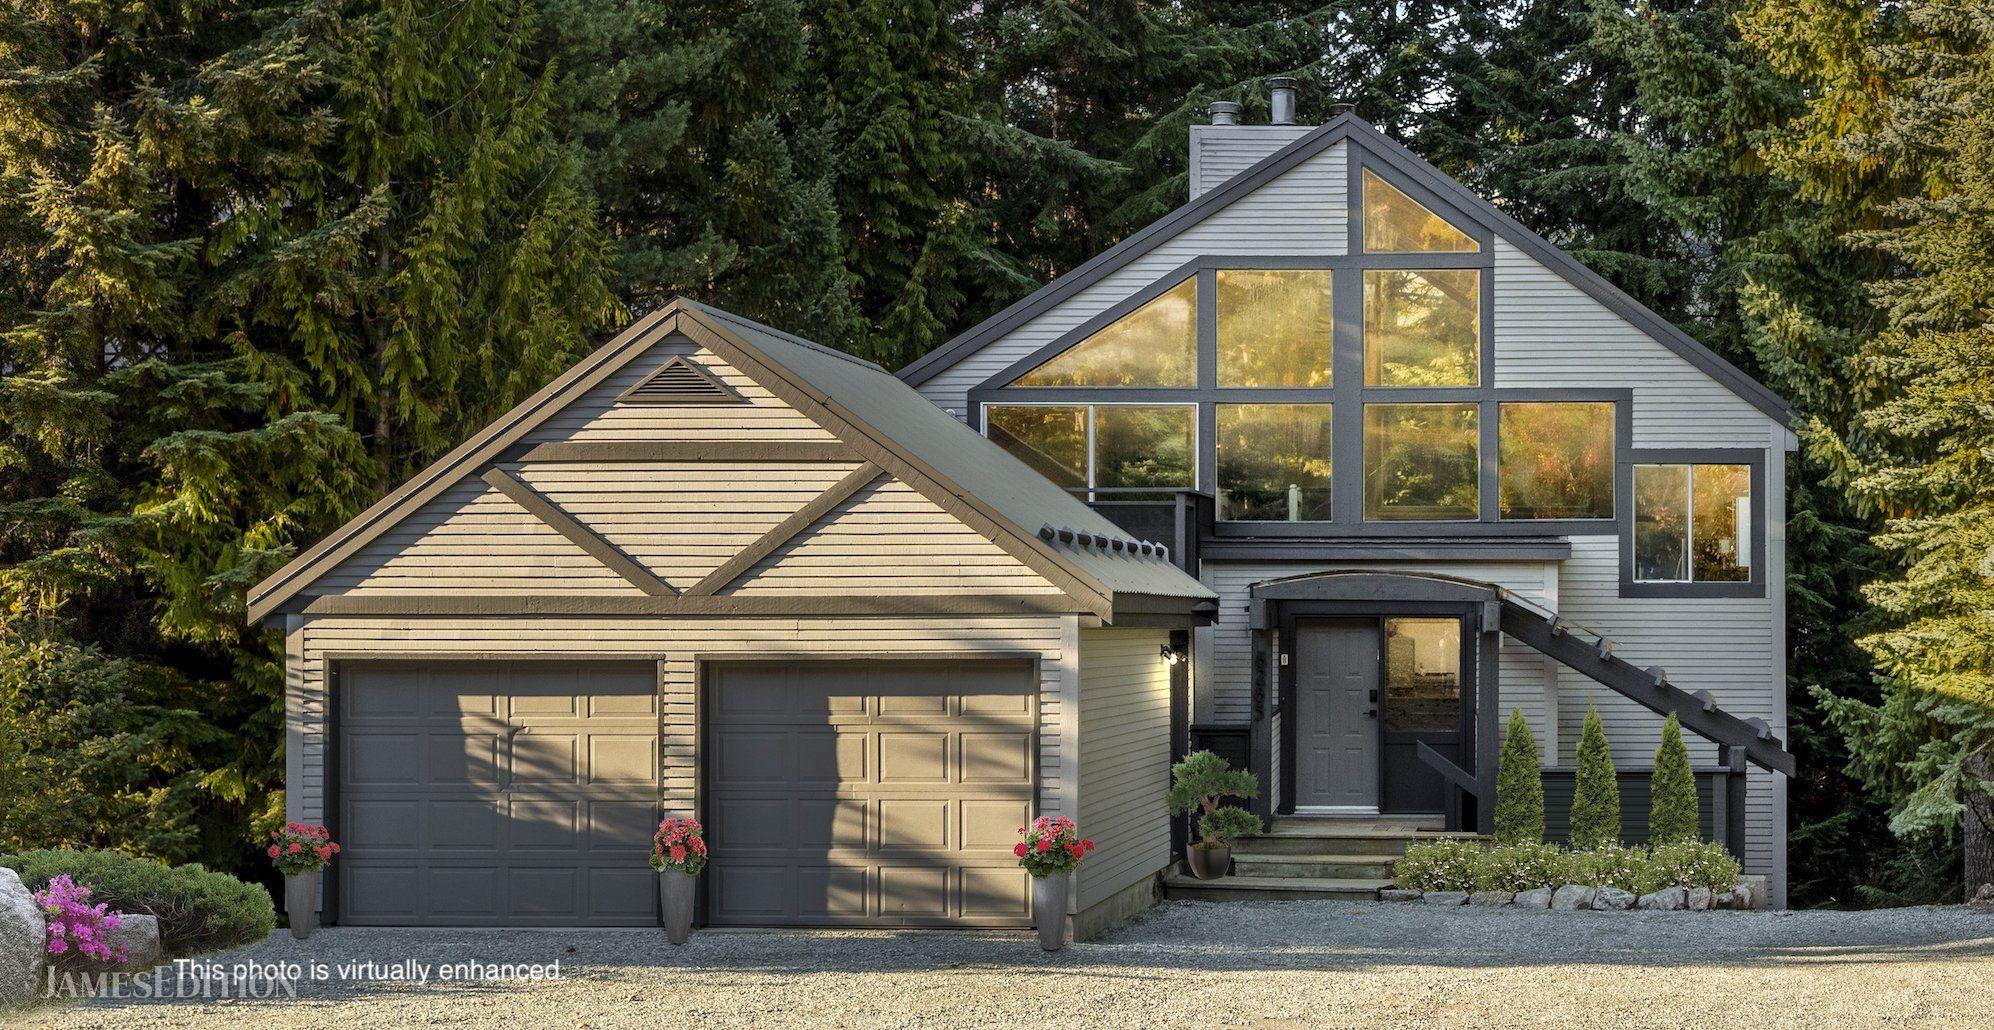 House in British Columbia, Canada 1 - 10762325